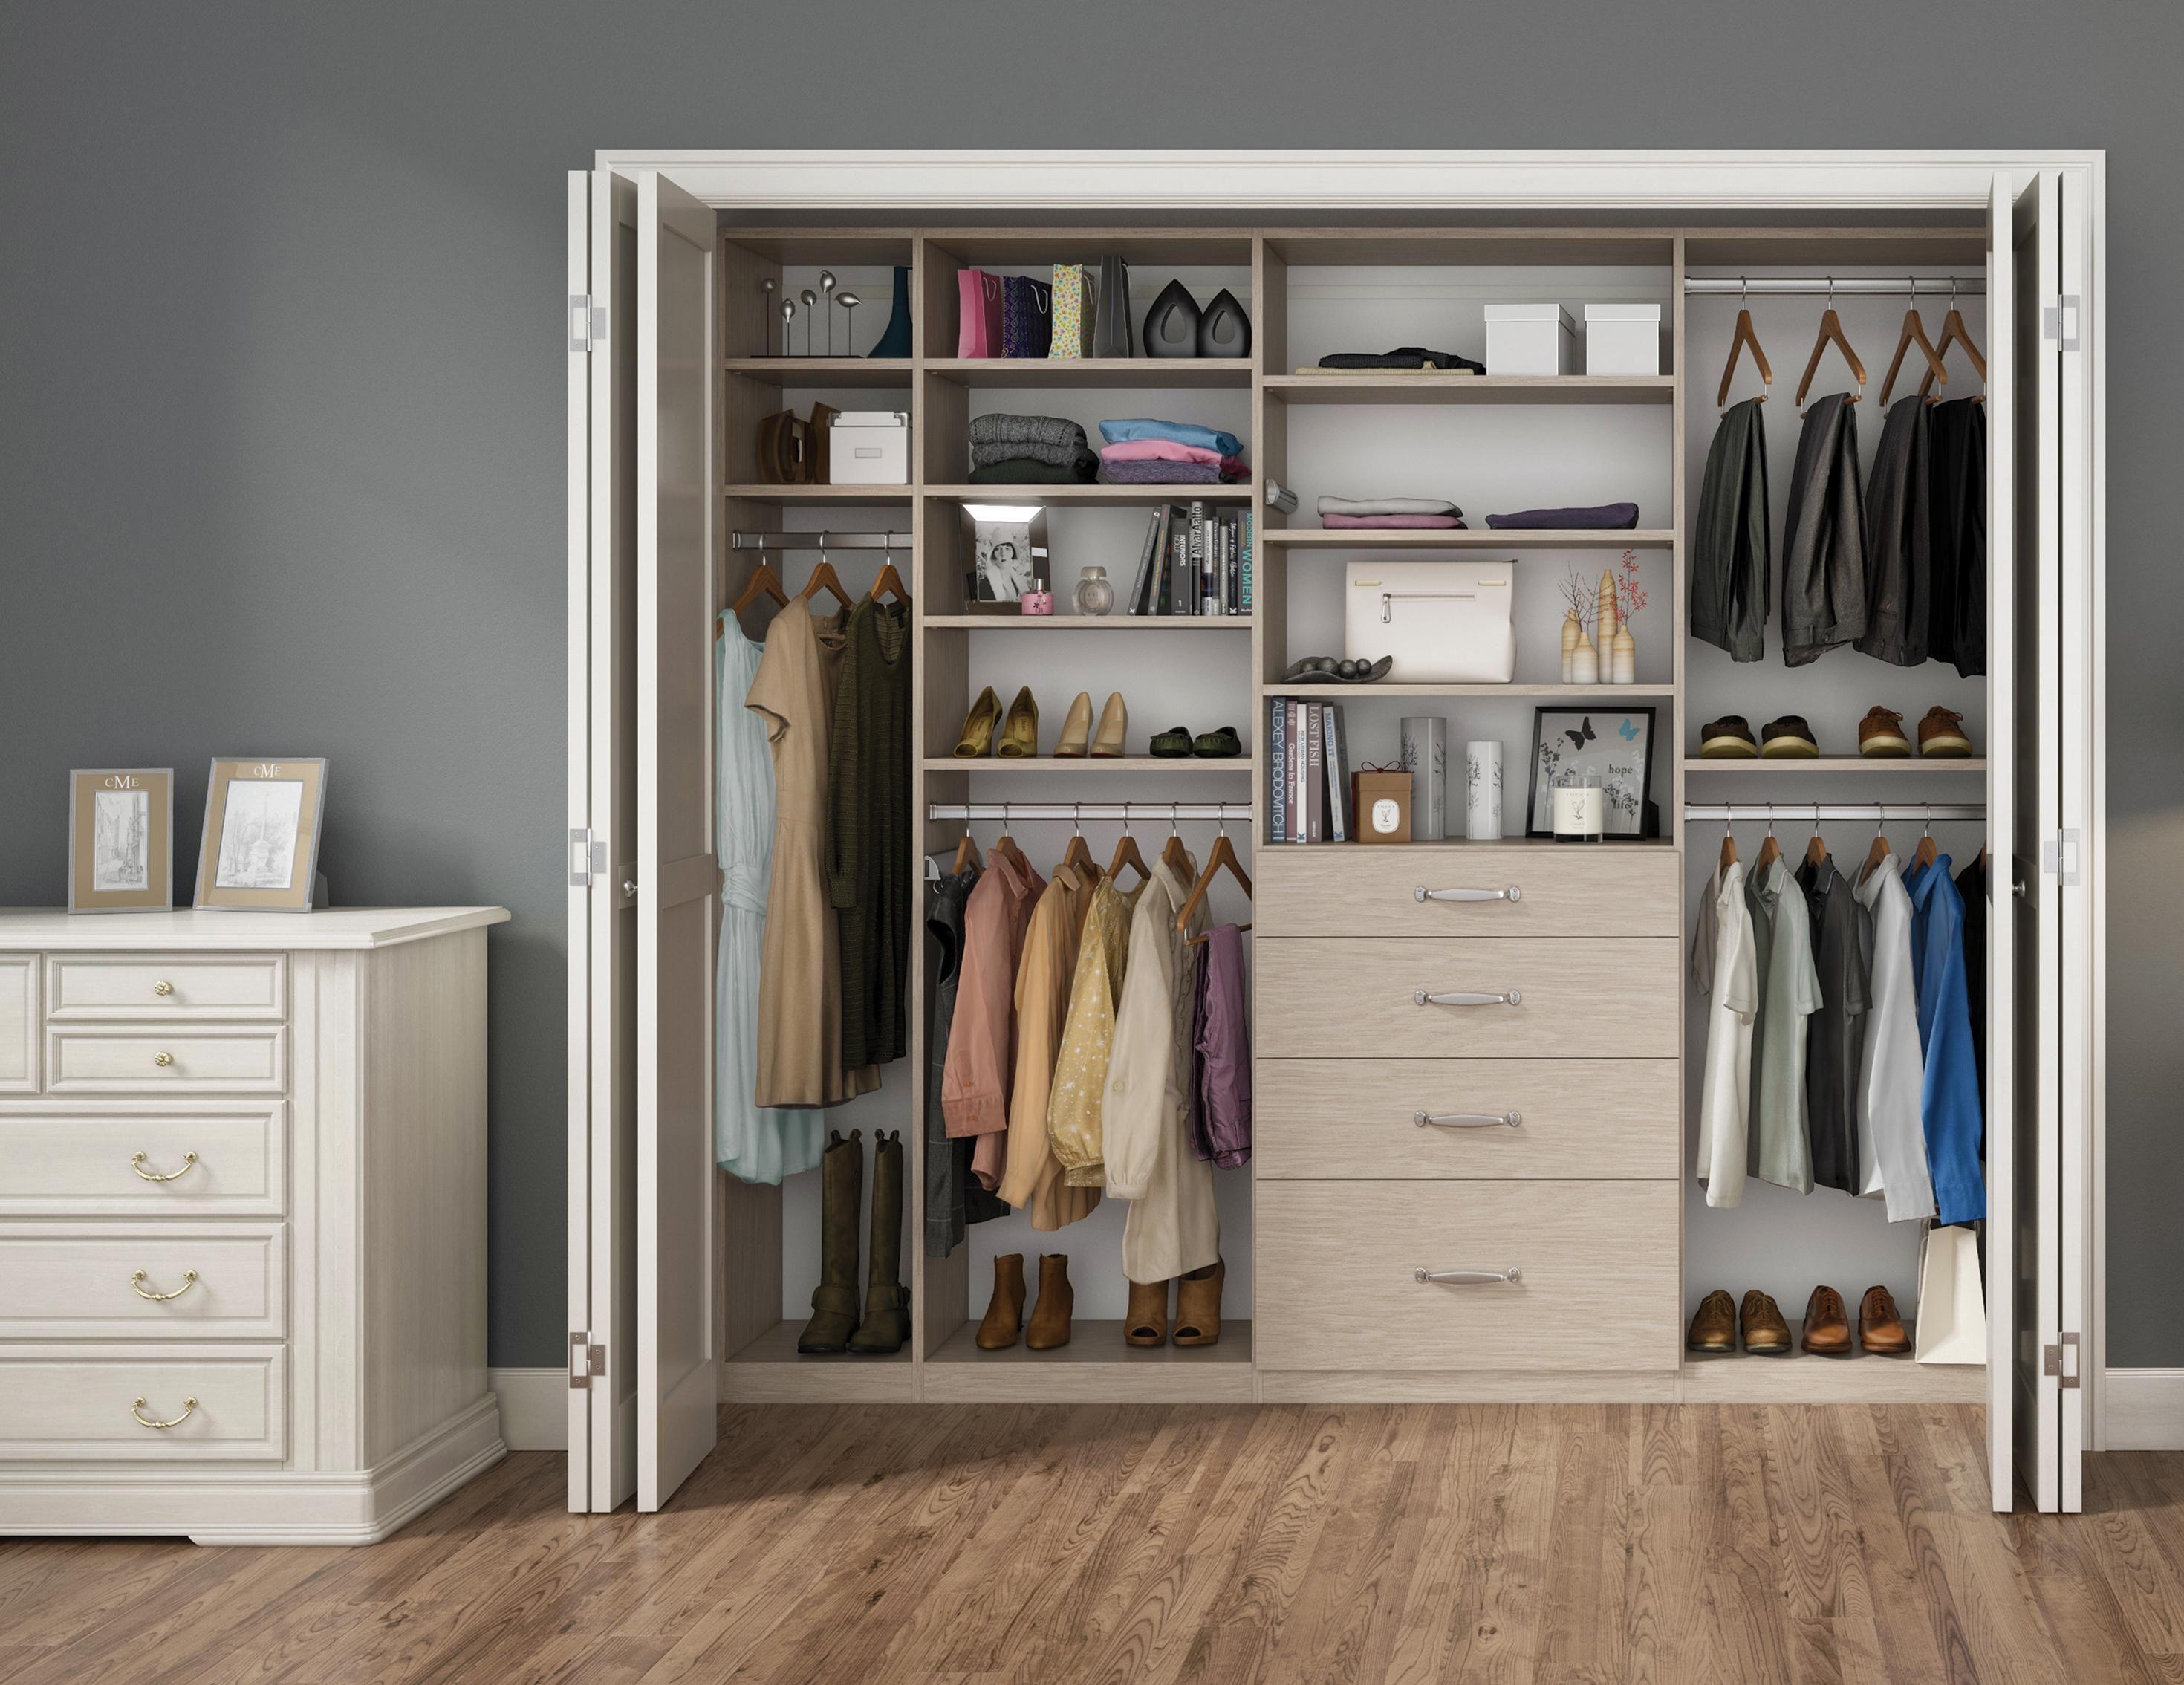 Reach In Closet Systems Closet designs, California